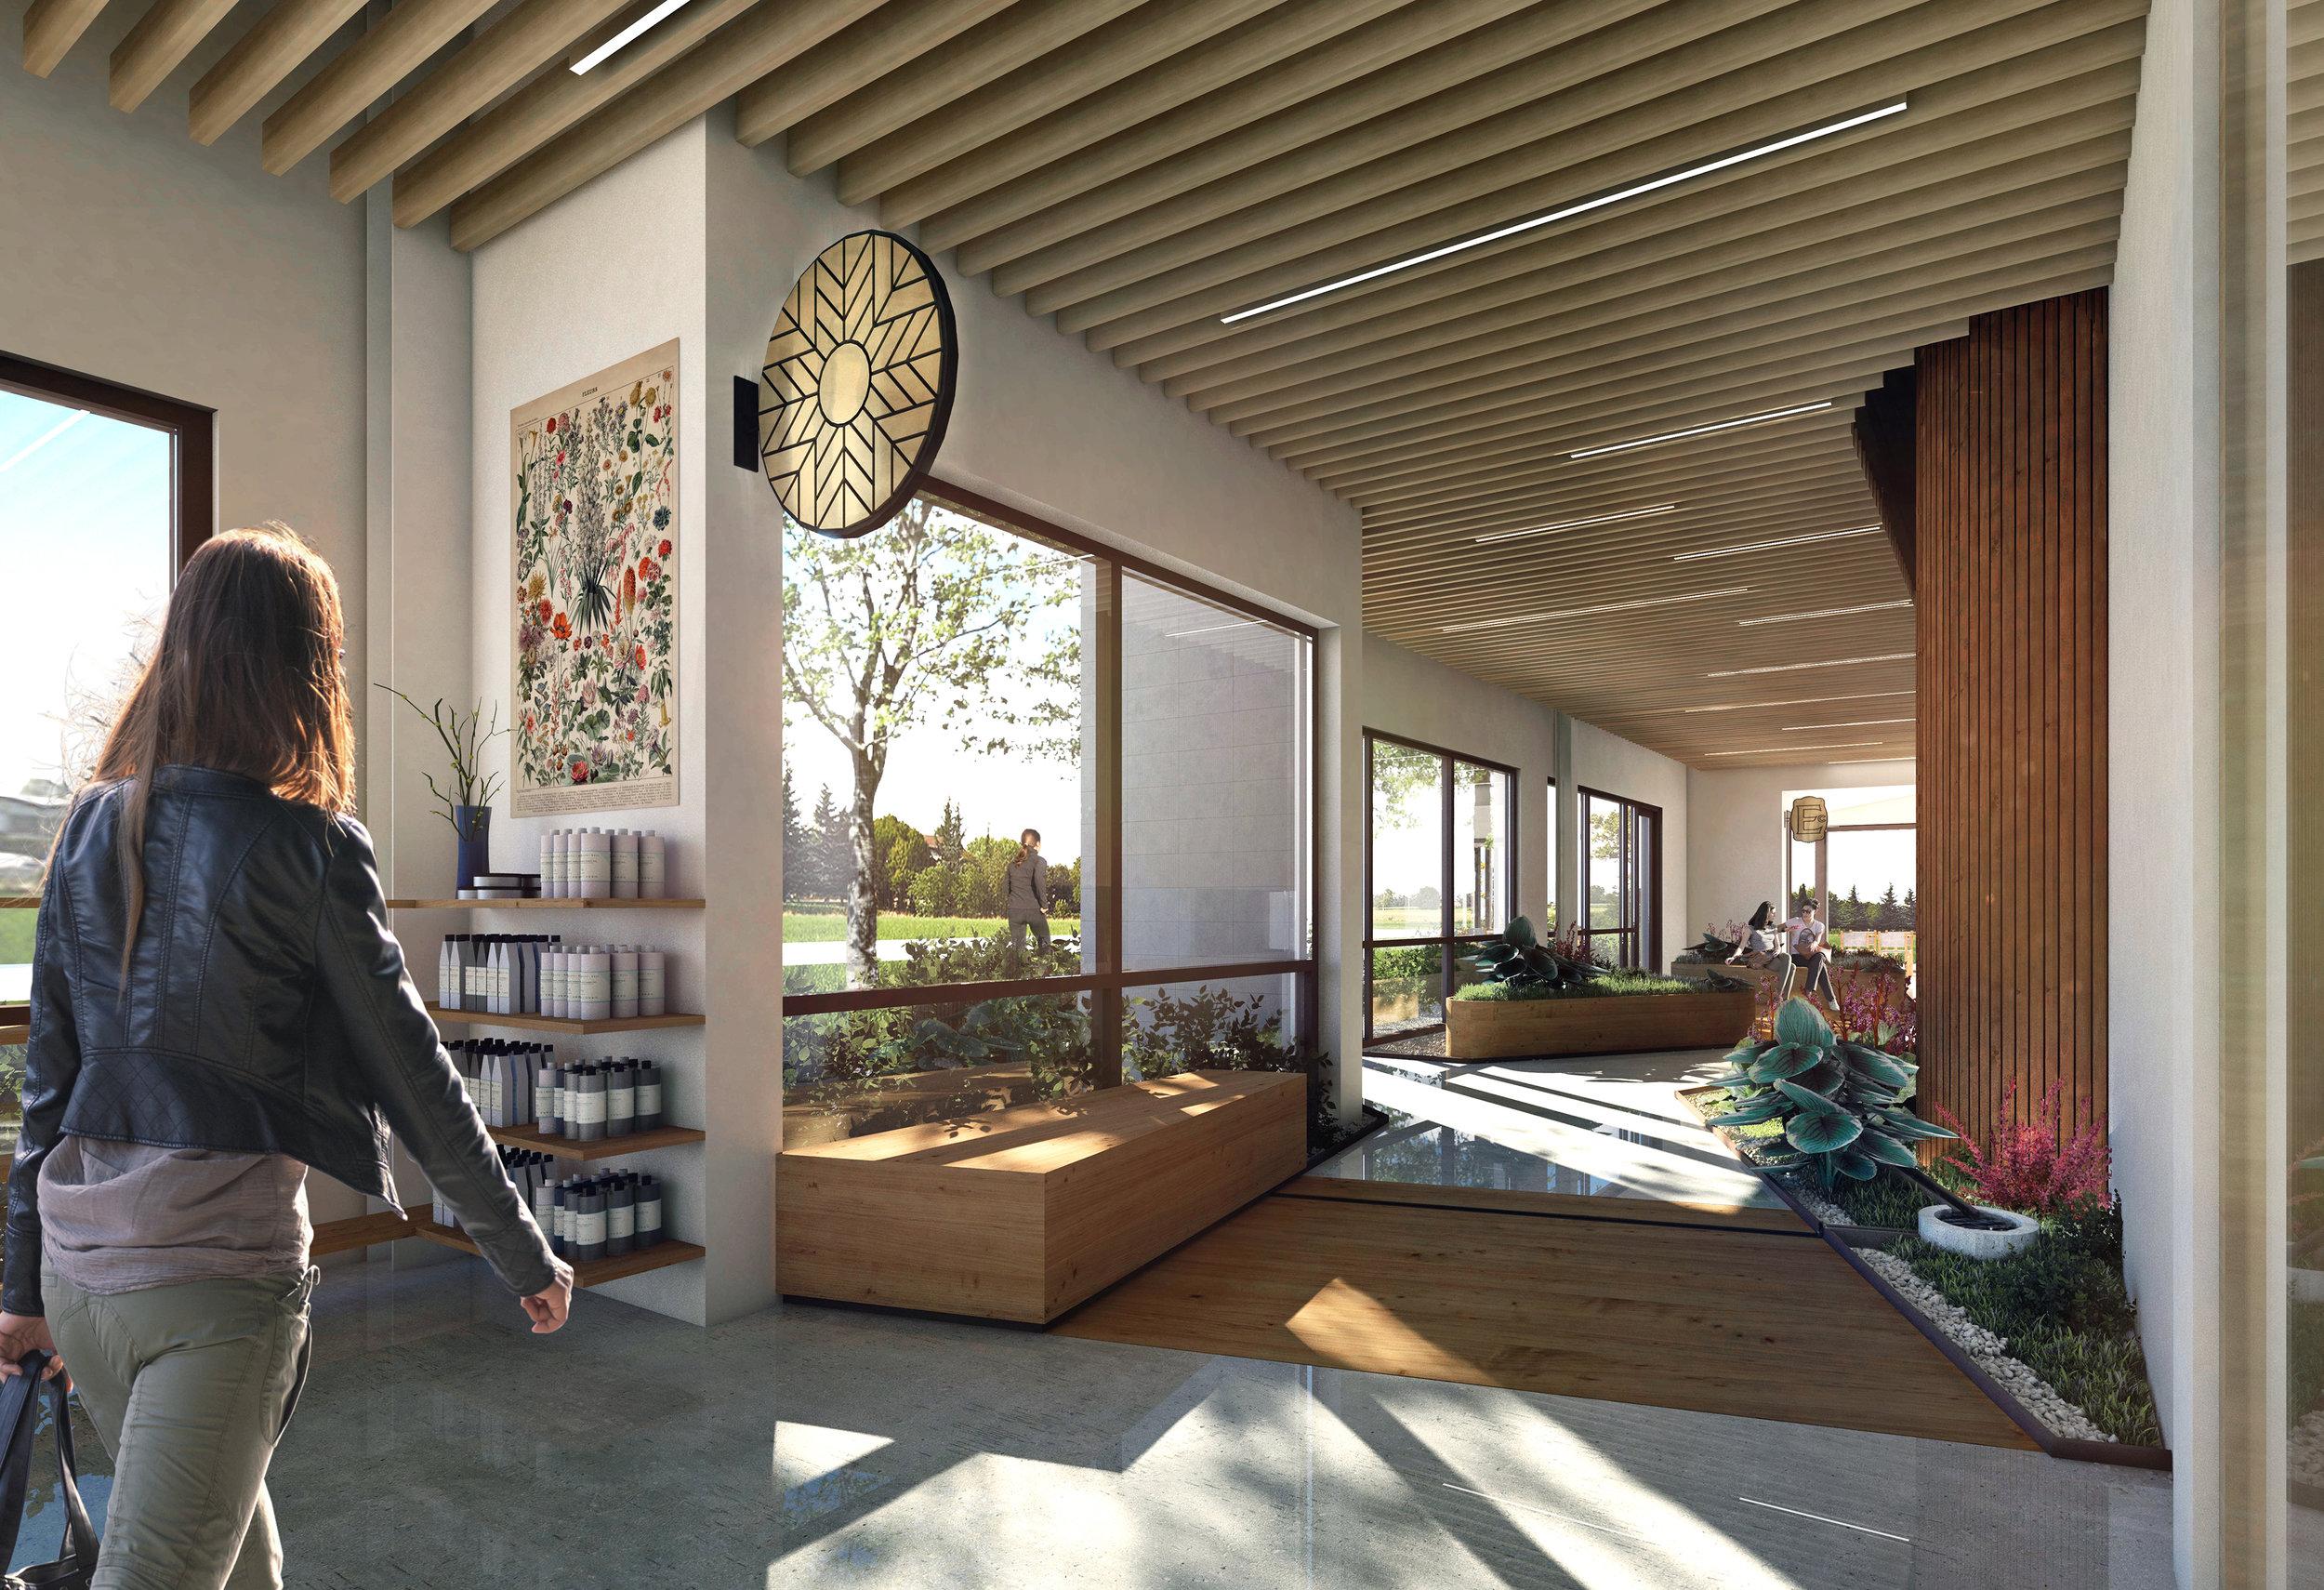 Alive + Well Wellness Center by Matt Fajkus Architecture_Rendering.jpg